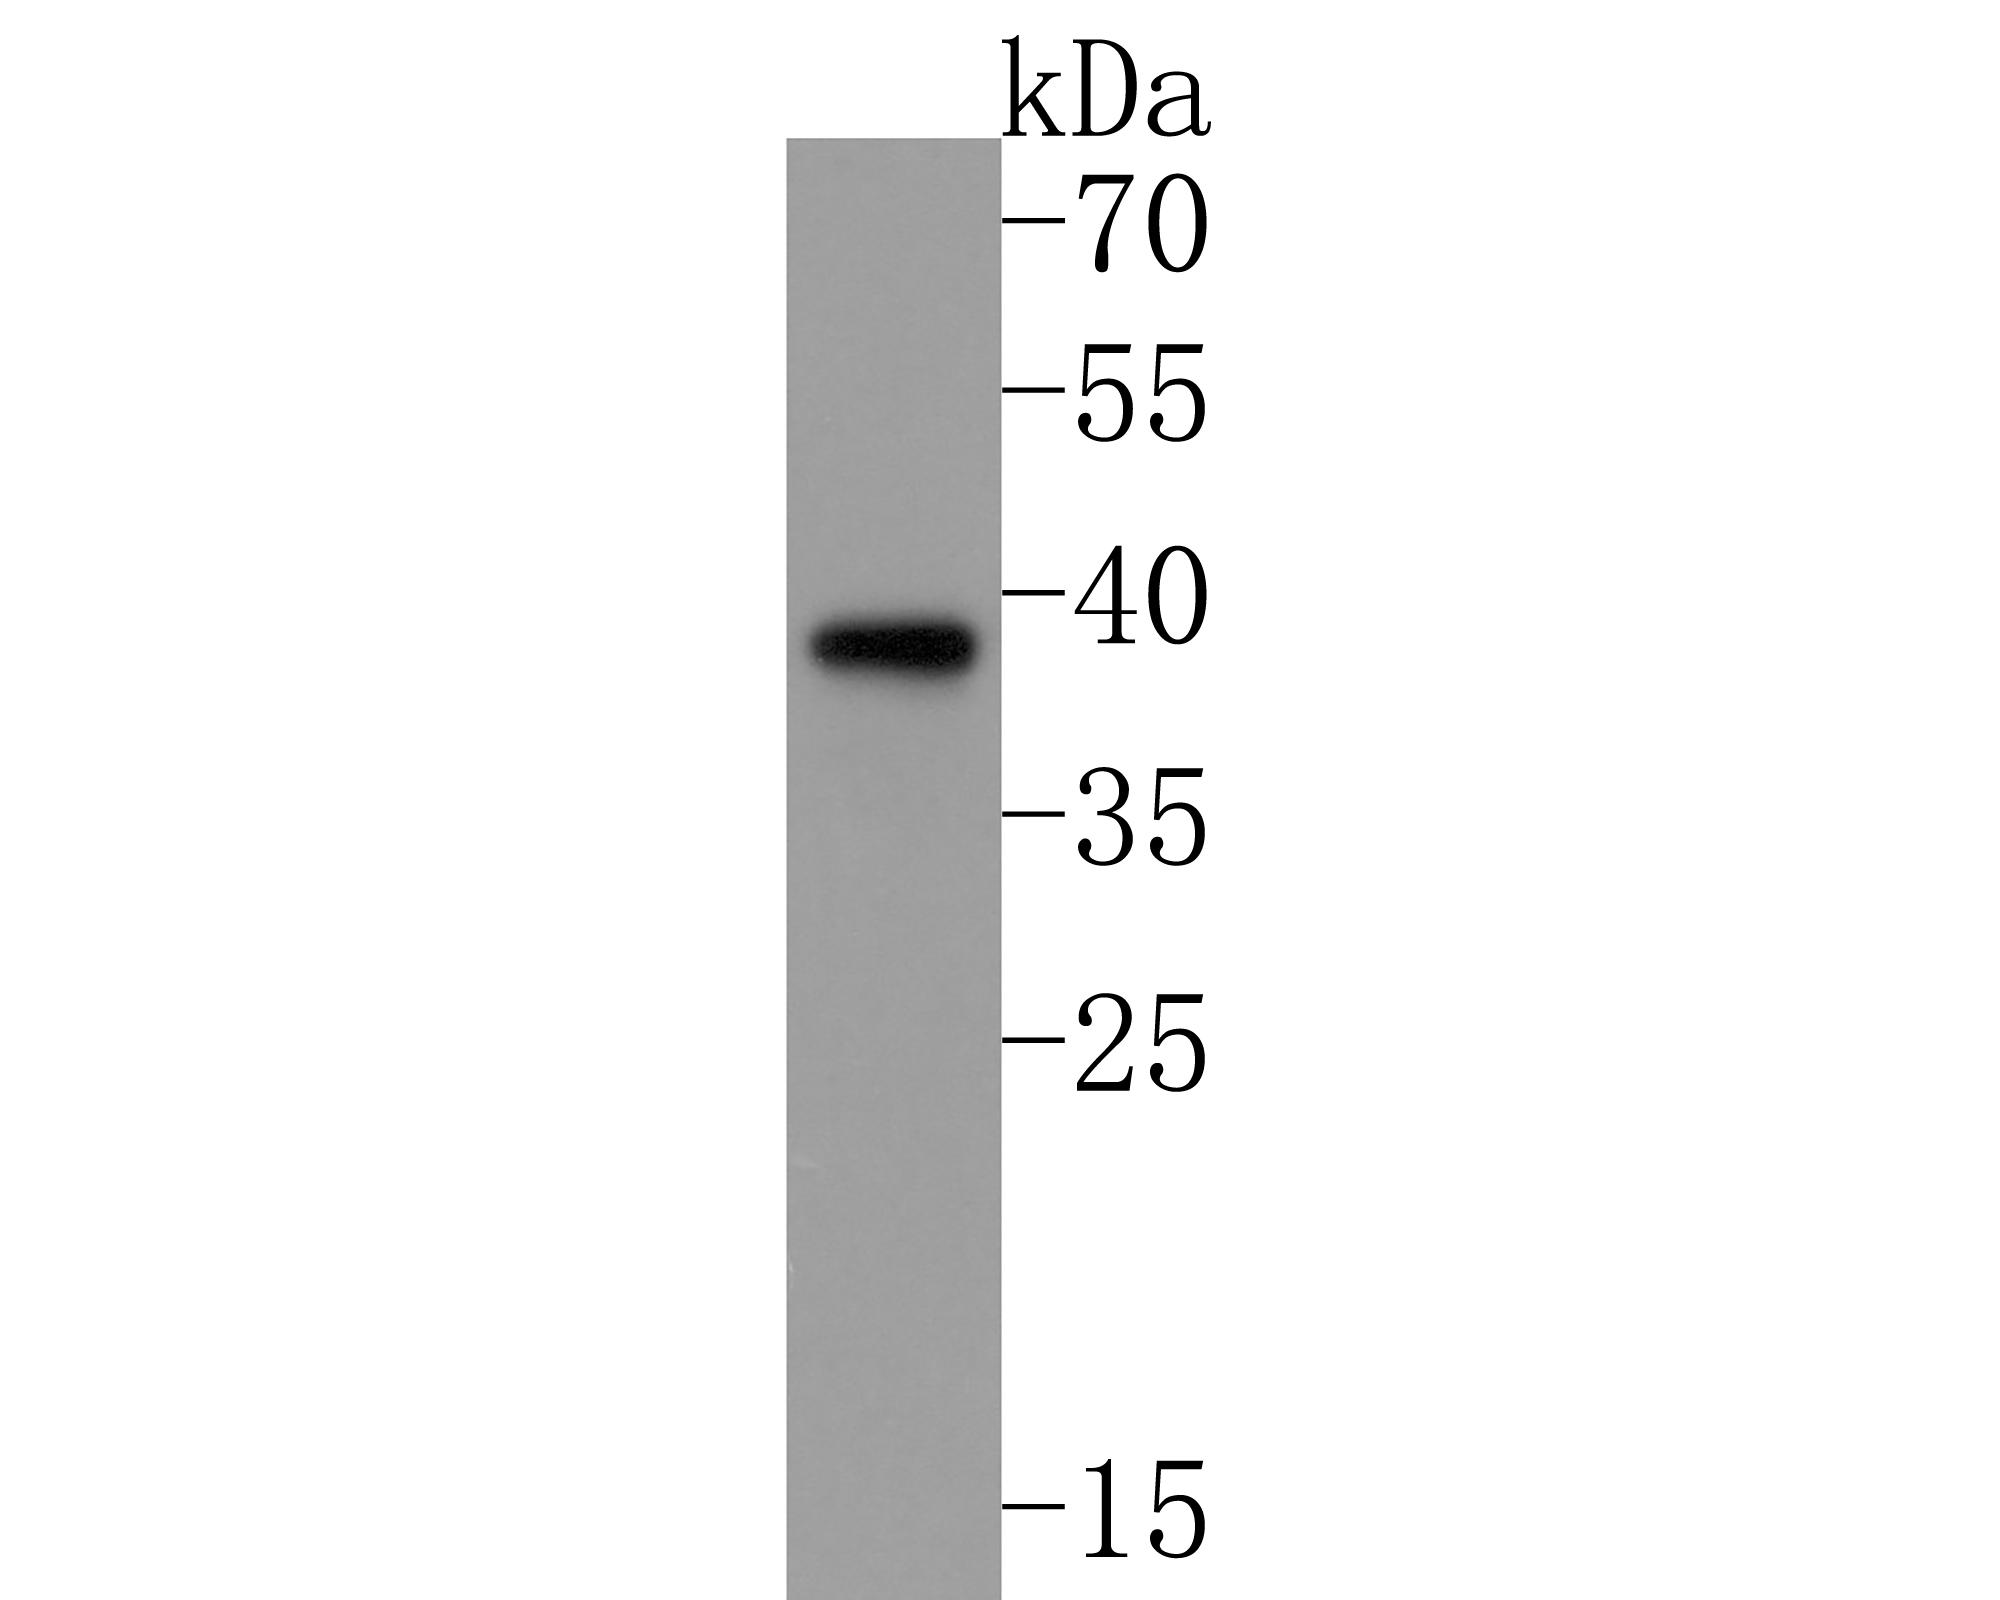 Western blot analysis of MEK3 on Hela lysates using anti-MEK3 antibody at 1/1,000 dilution.